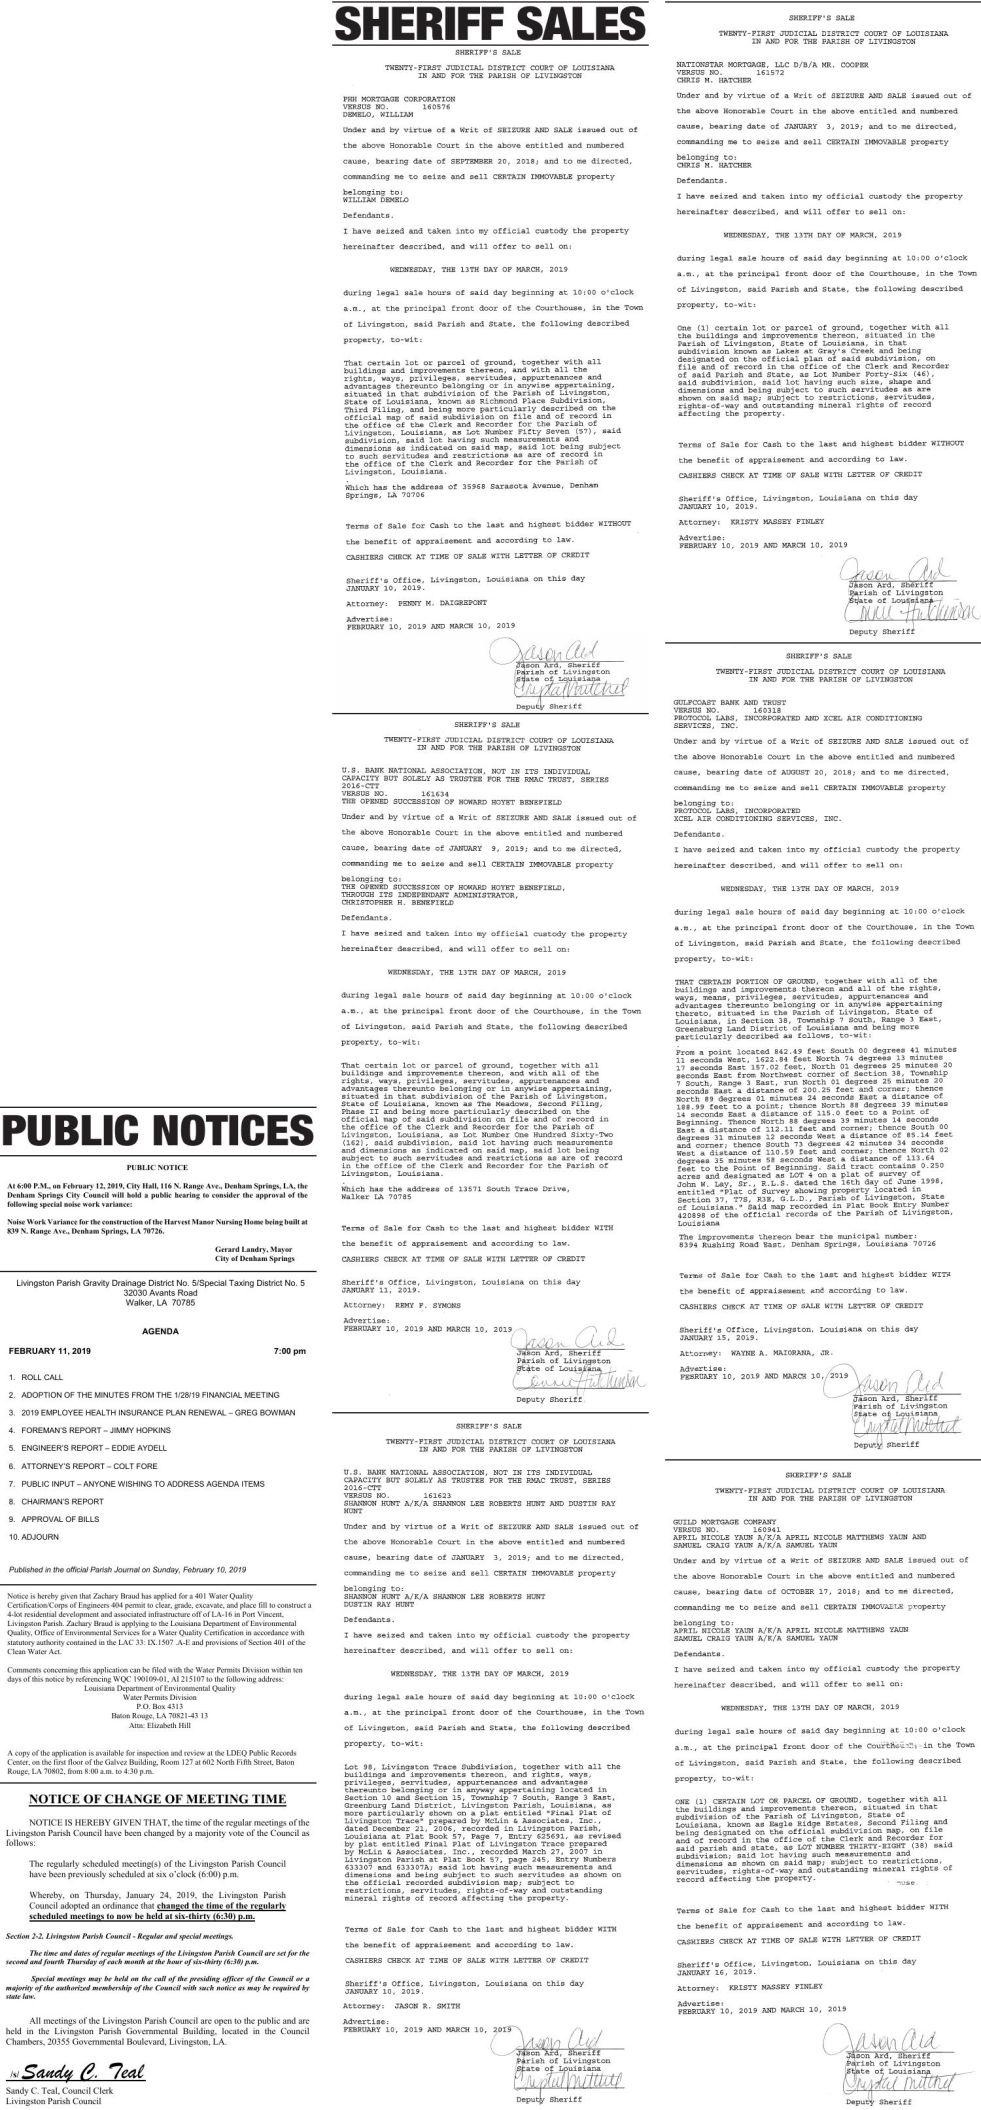 Public Notices published February 10, 2019